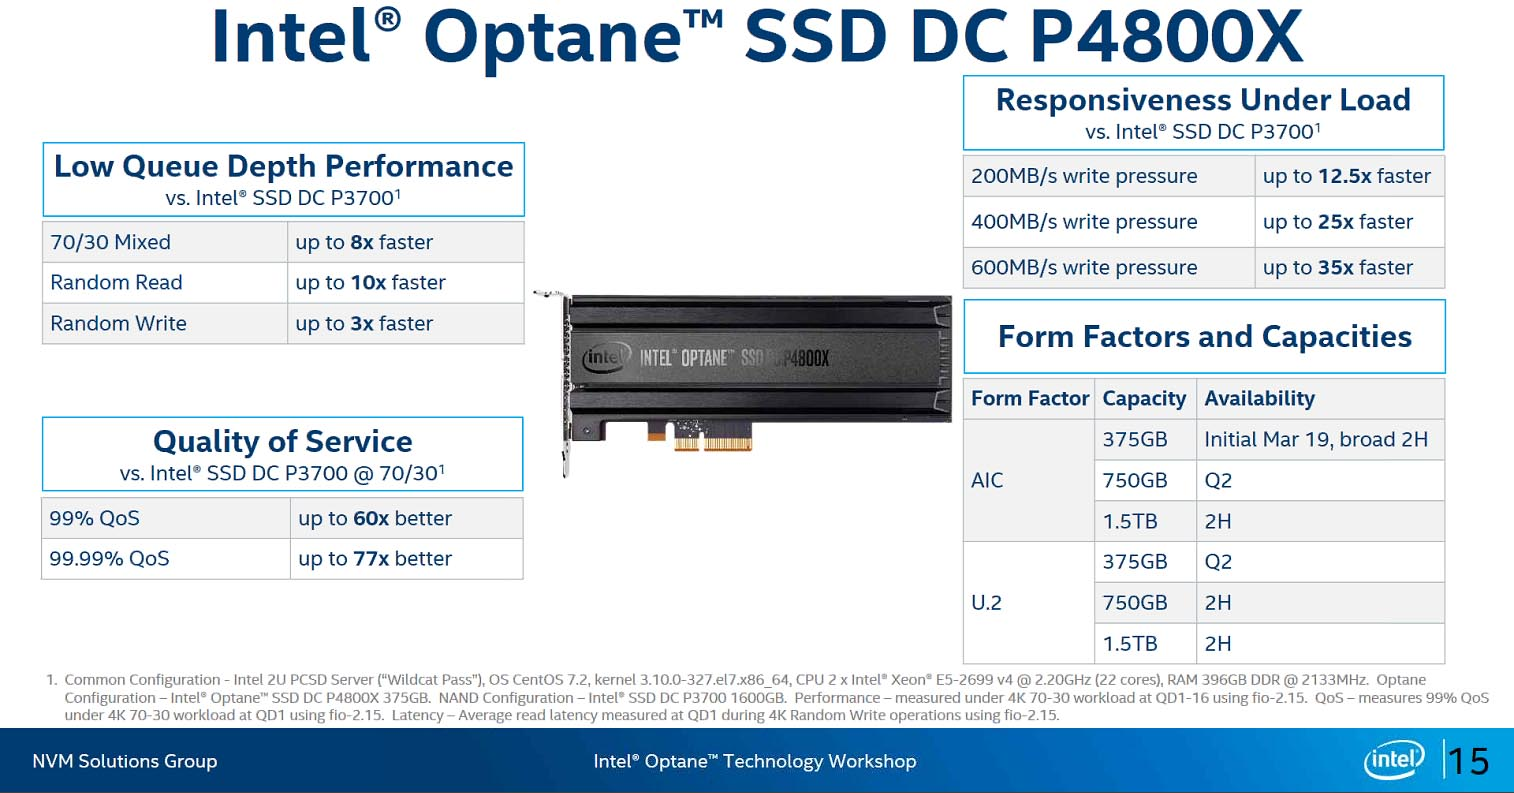 Intel Optane P4800X